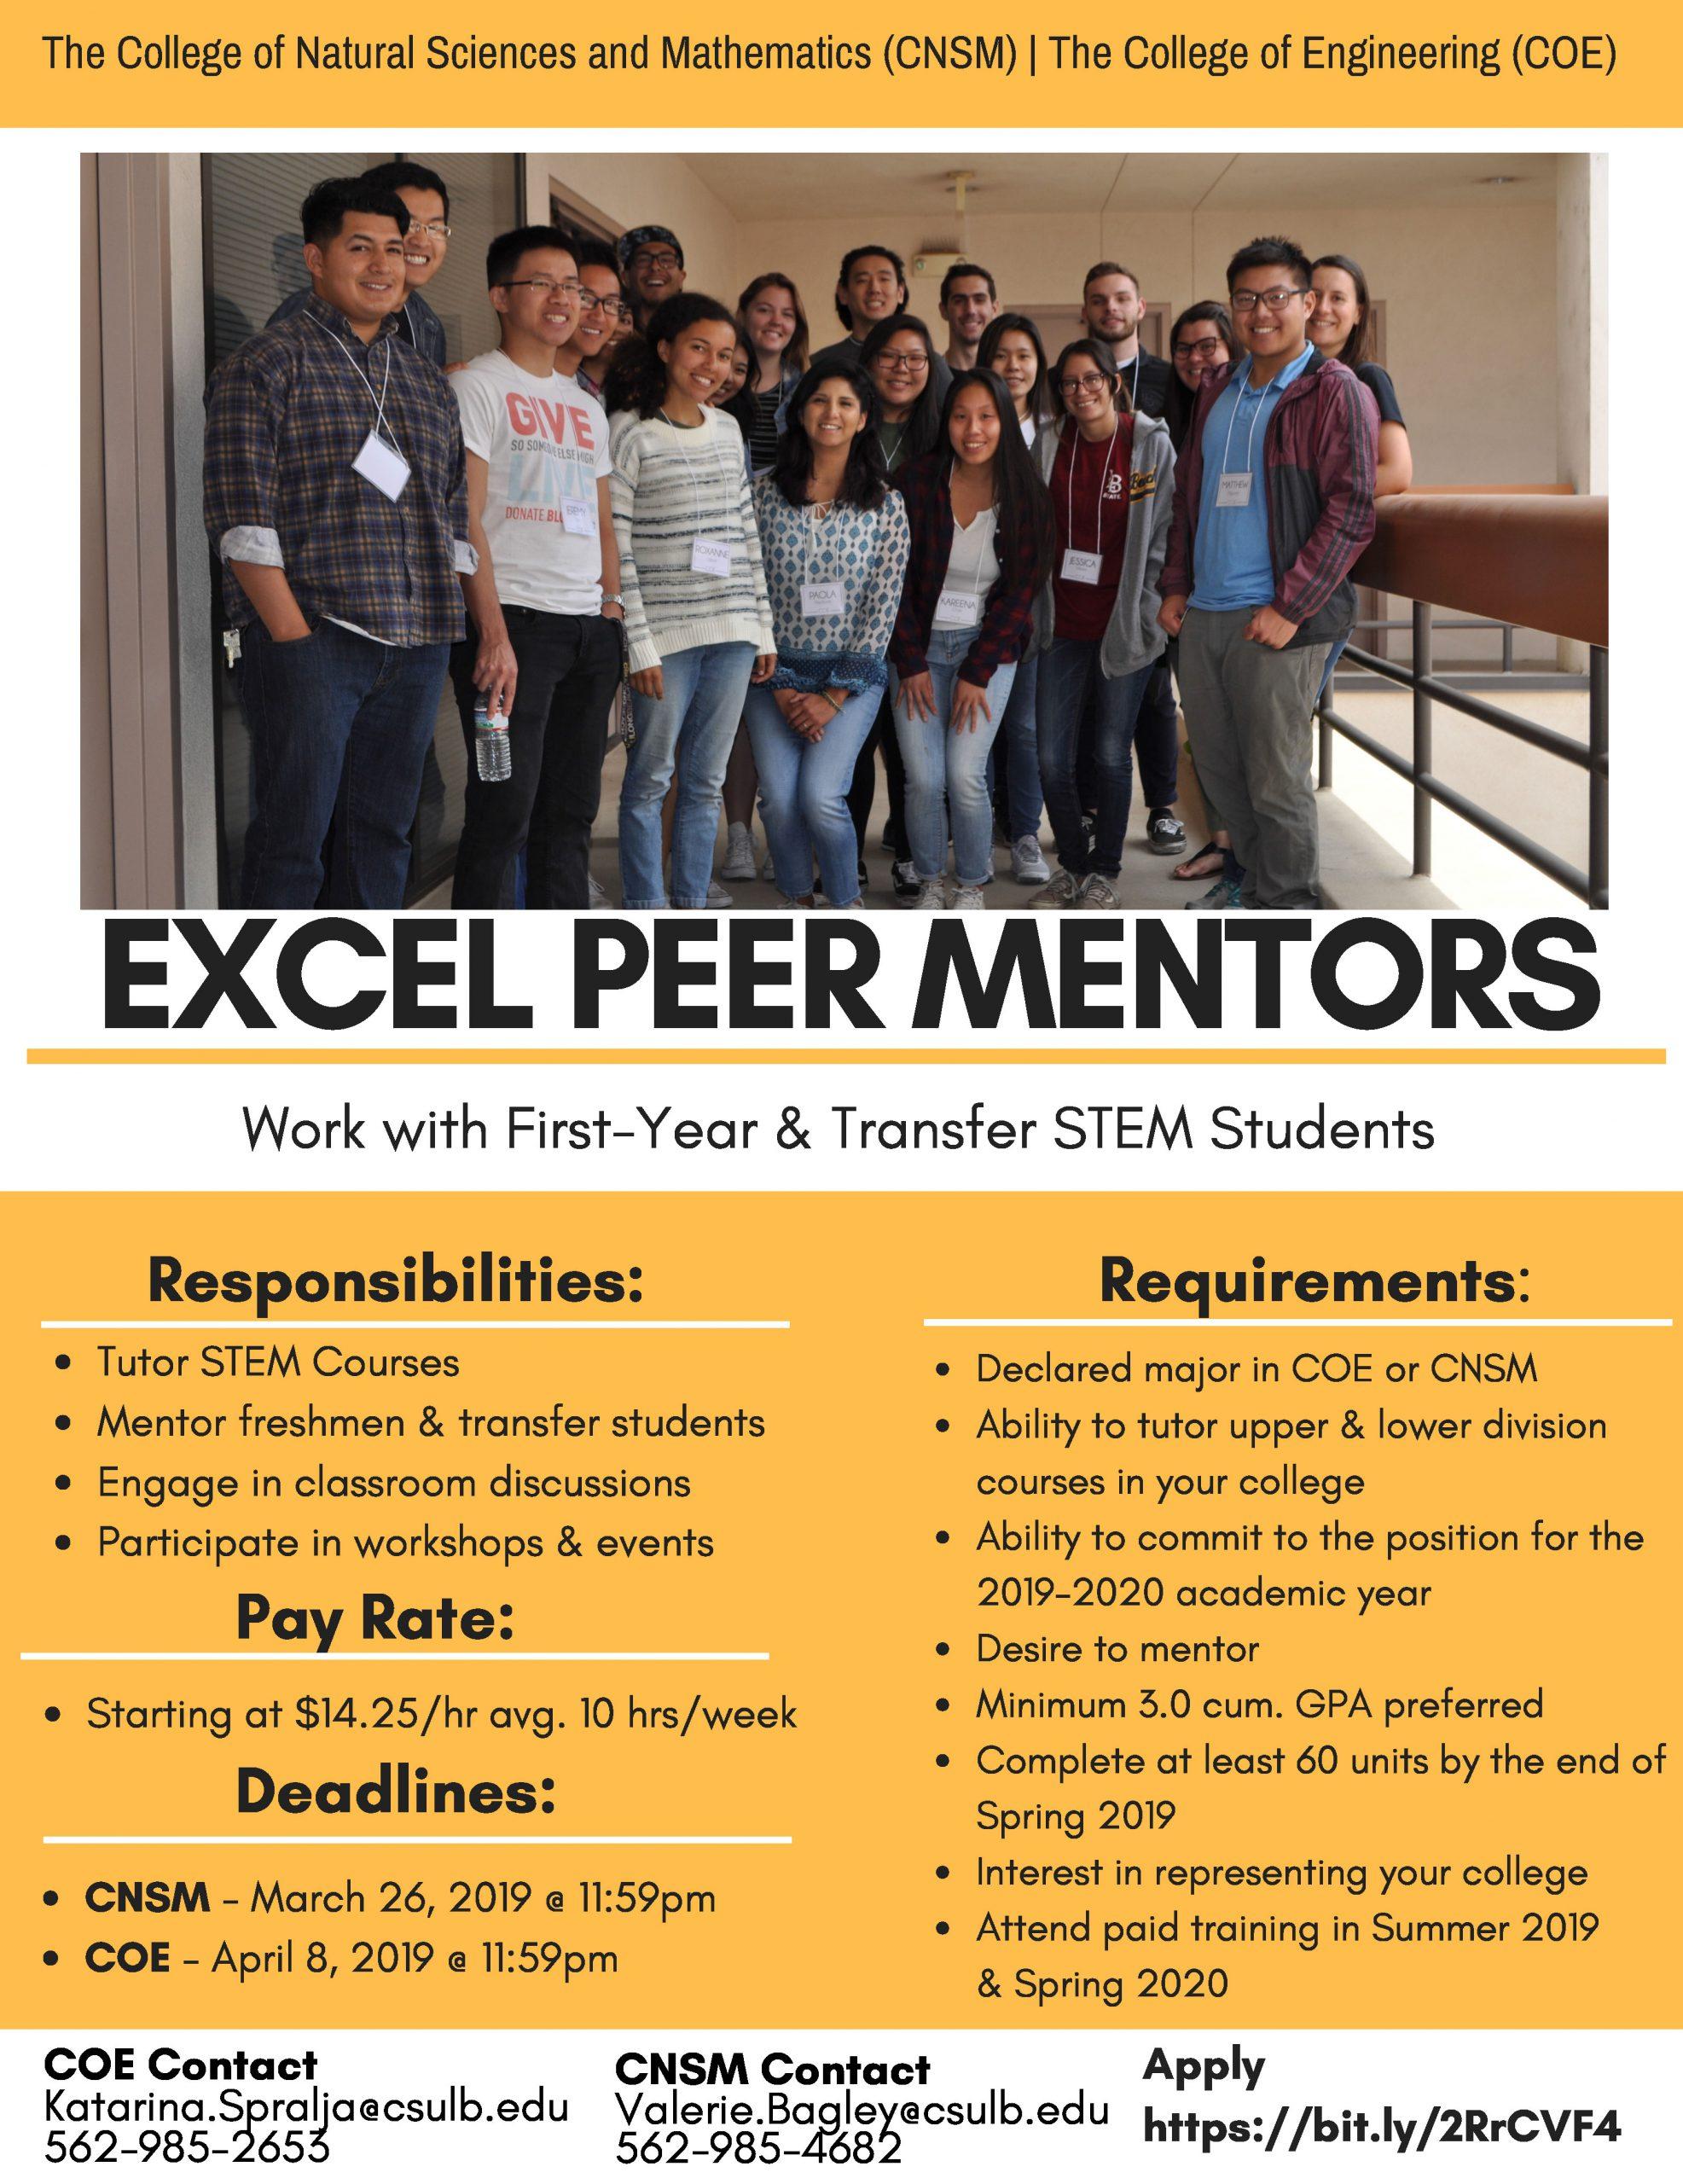 Excel Peer Mentors | Hsi Stem In Summer School Calendar For Long Beach Cal State 2020